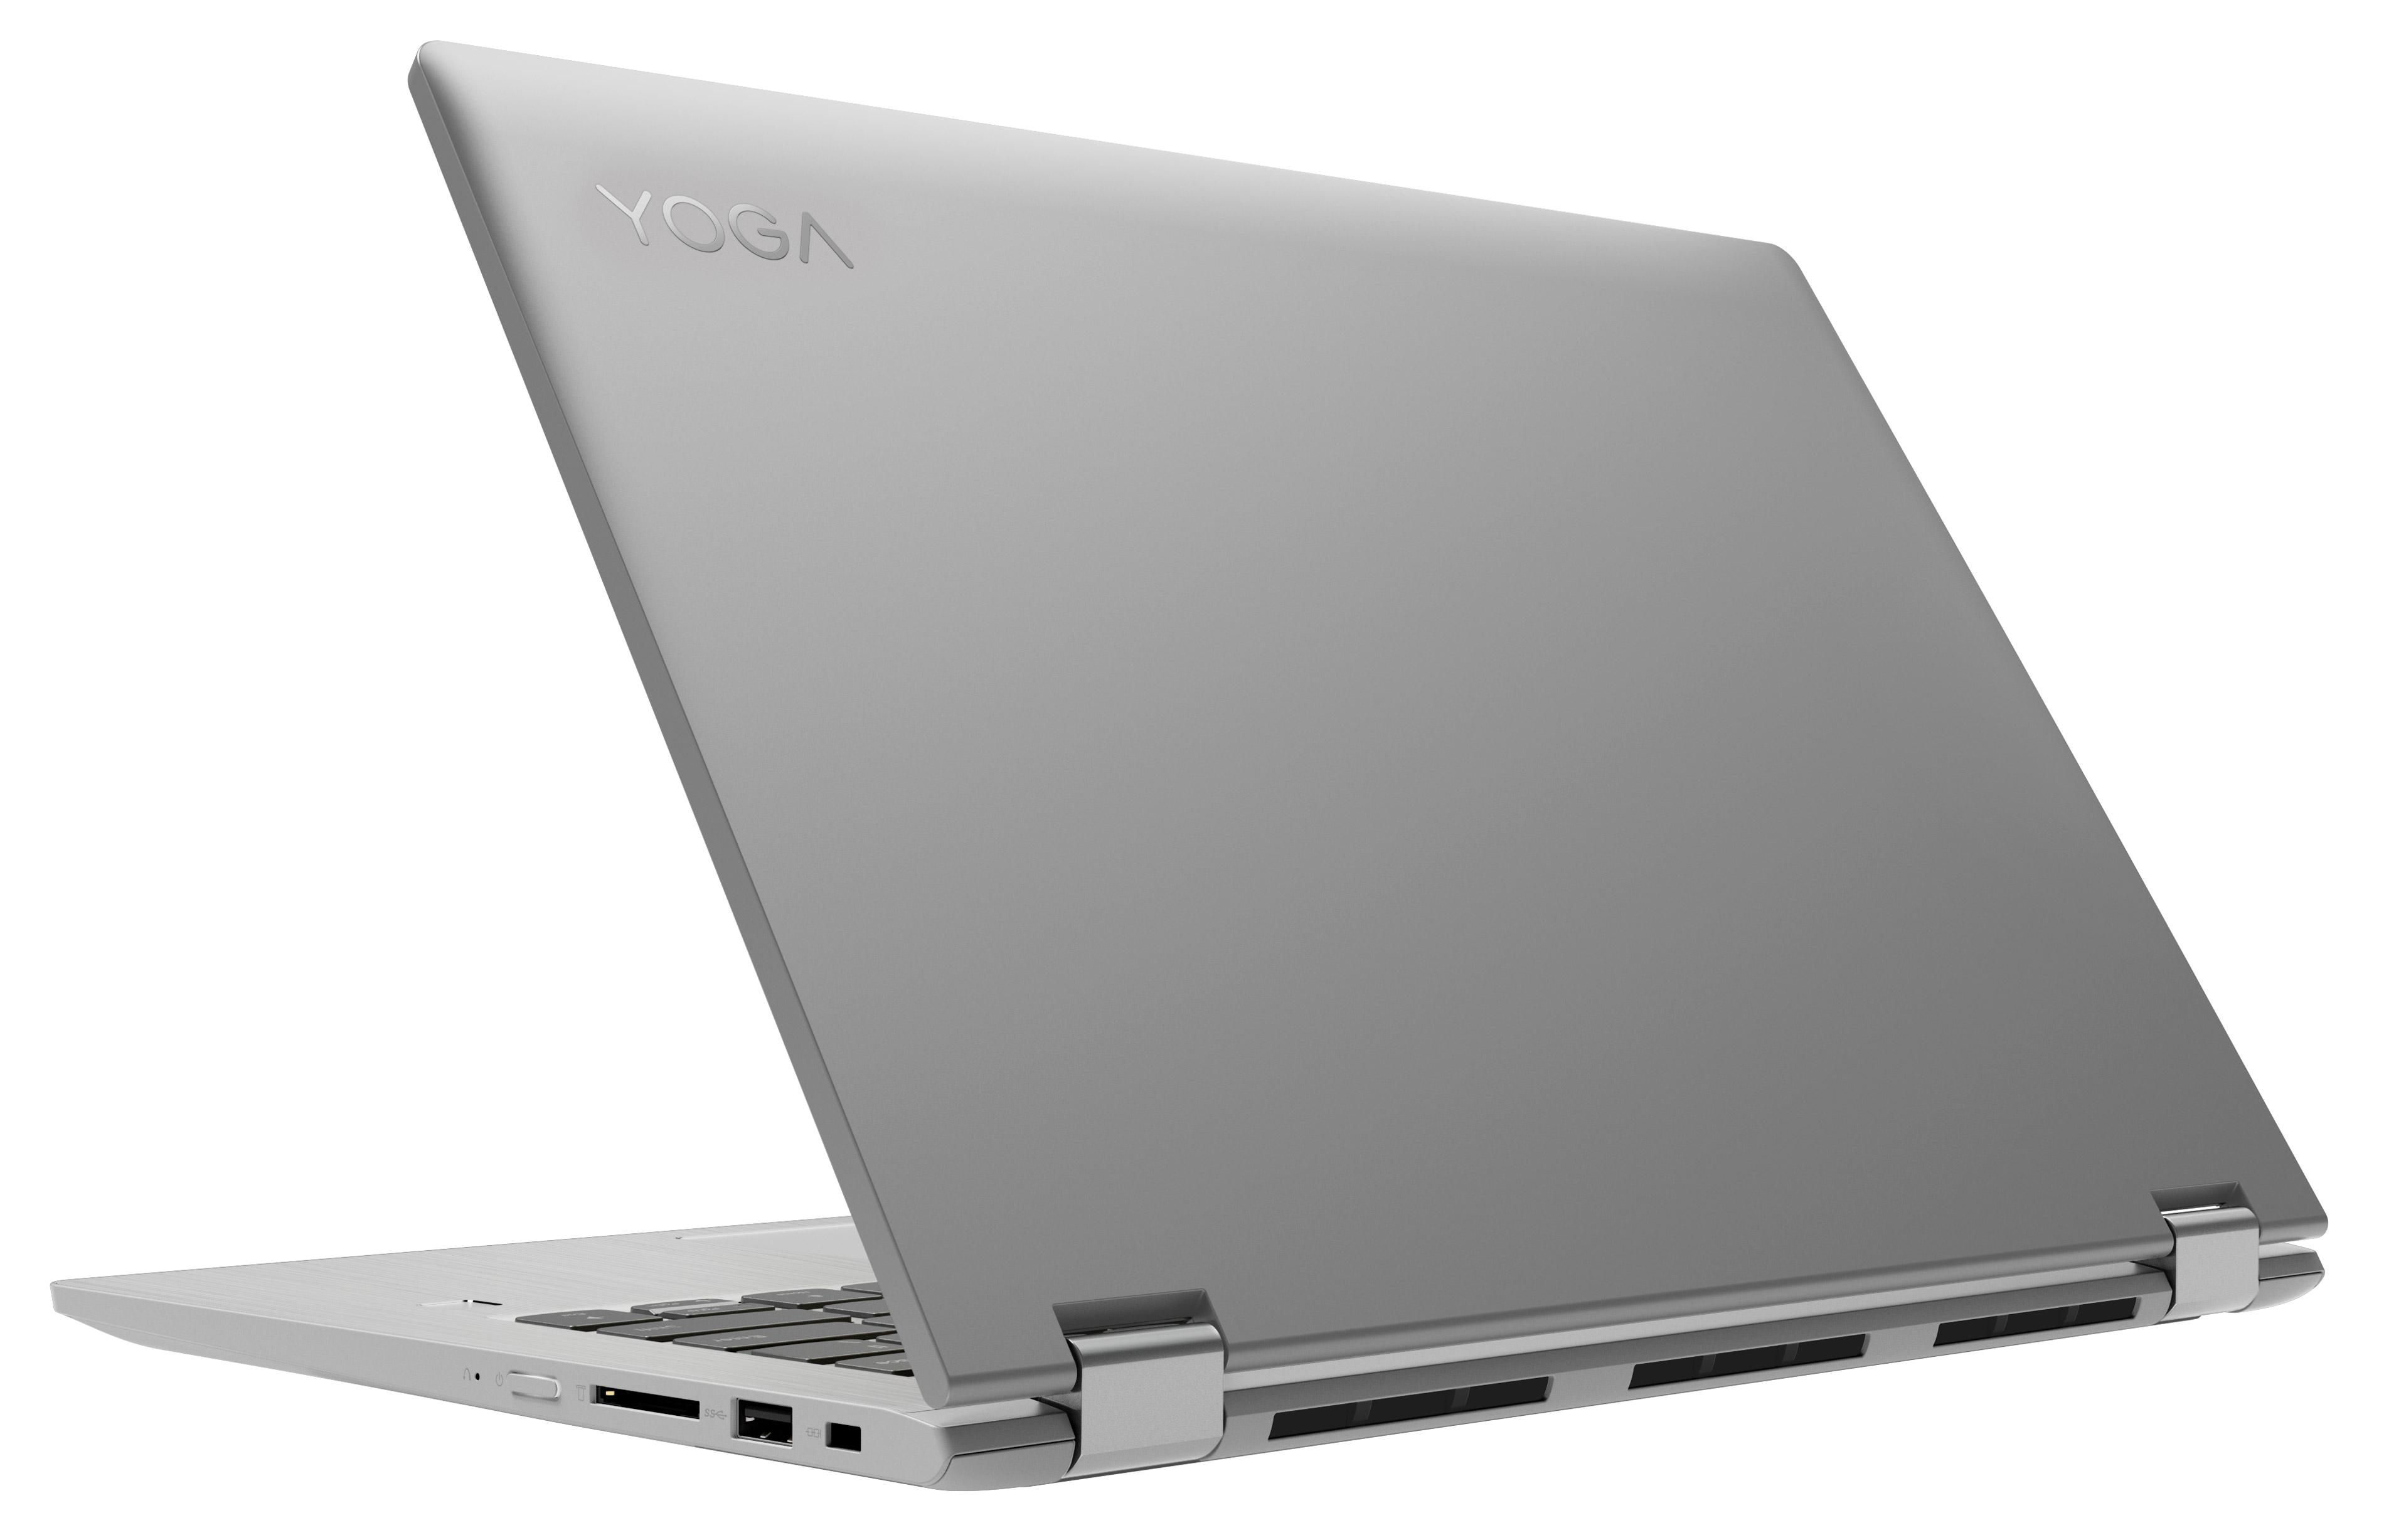 Фото  Ультрабук Lenovo Yoga 530 Mineral Grey (81EK00KKRA)